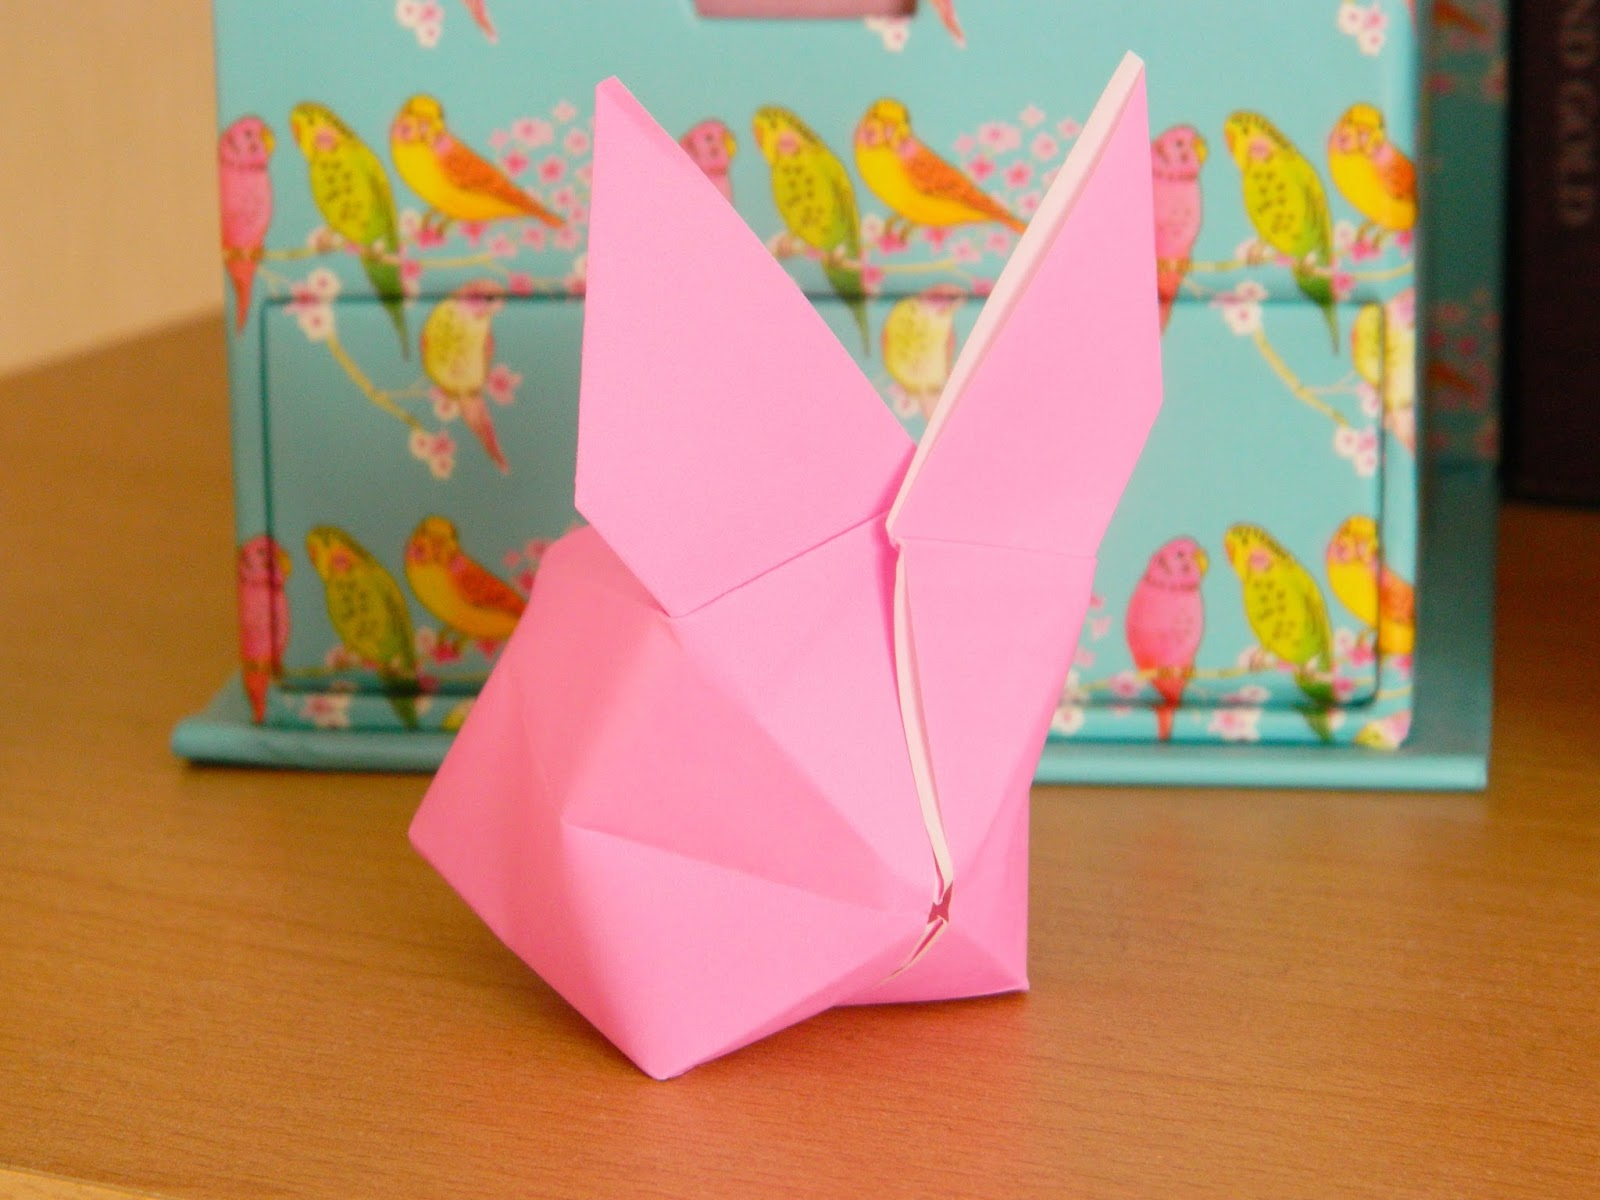 ORIGAMI EASTER BUNNY RABBITS. | Origami für kinder, Origami, Diy ... | 1200x1600